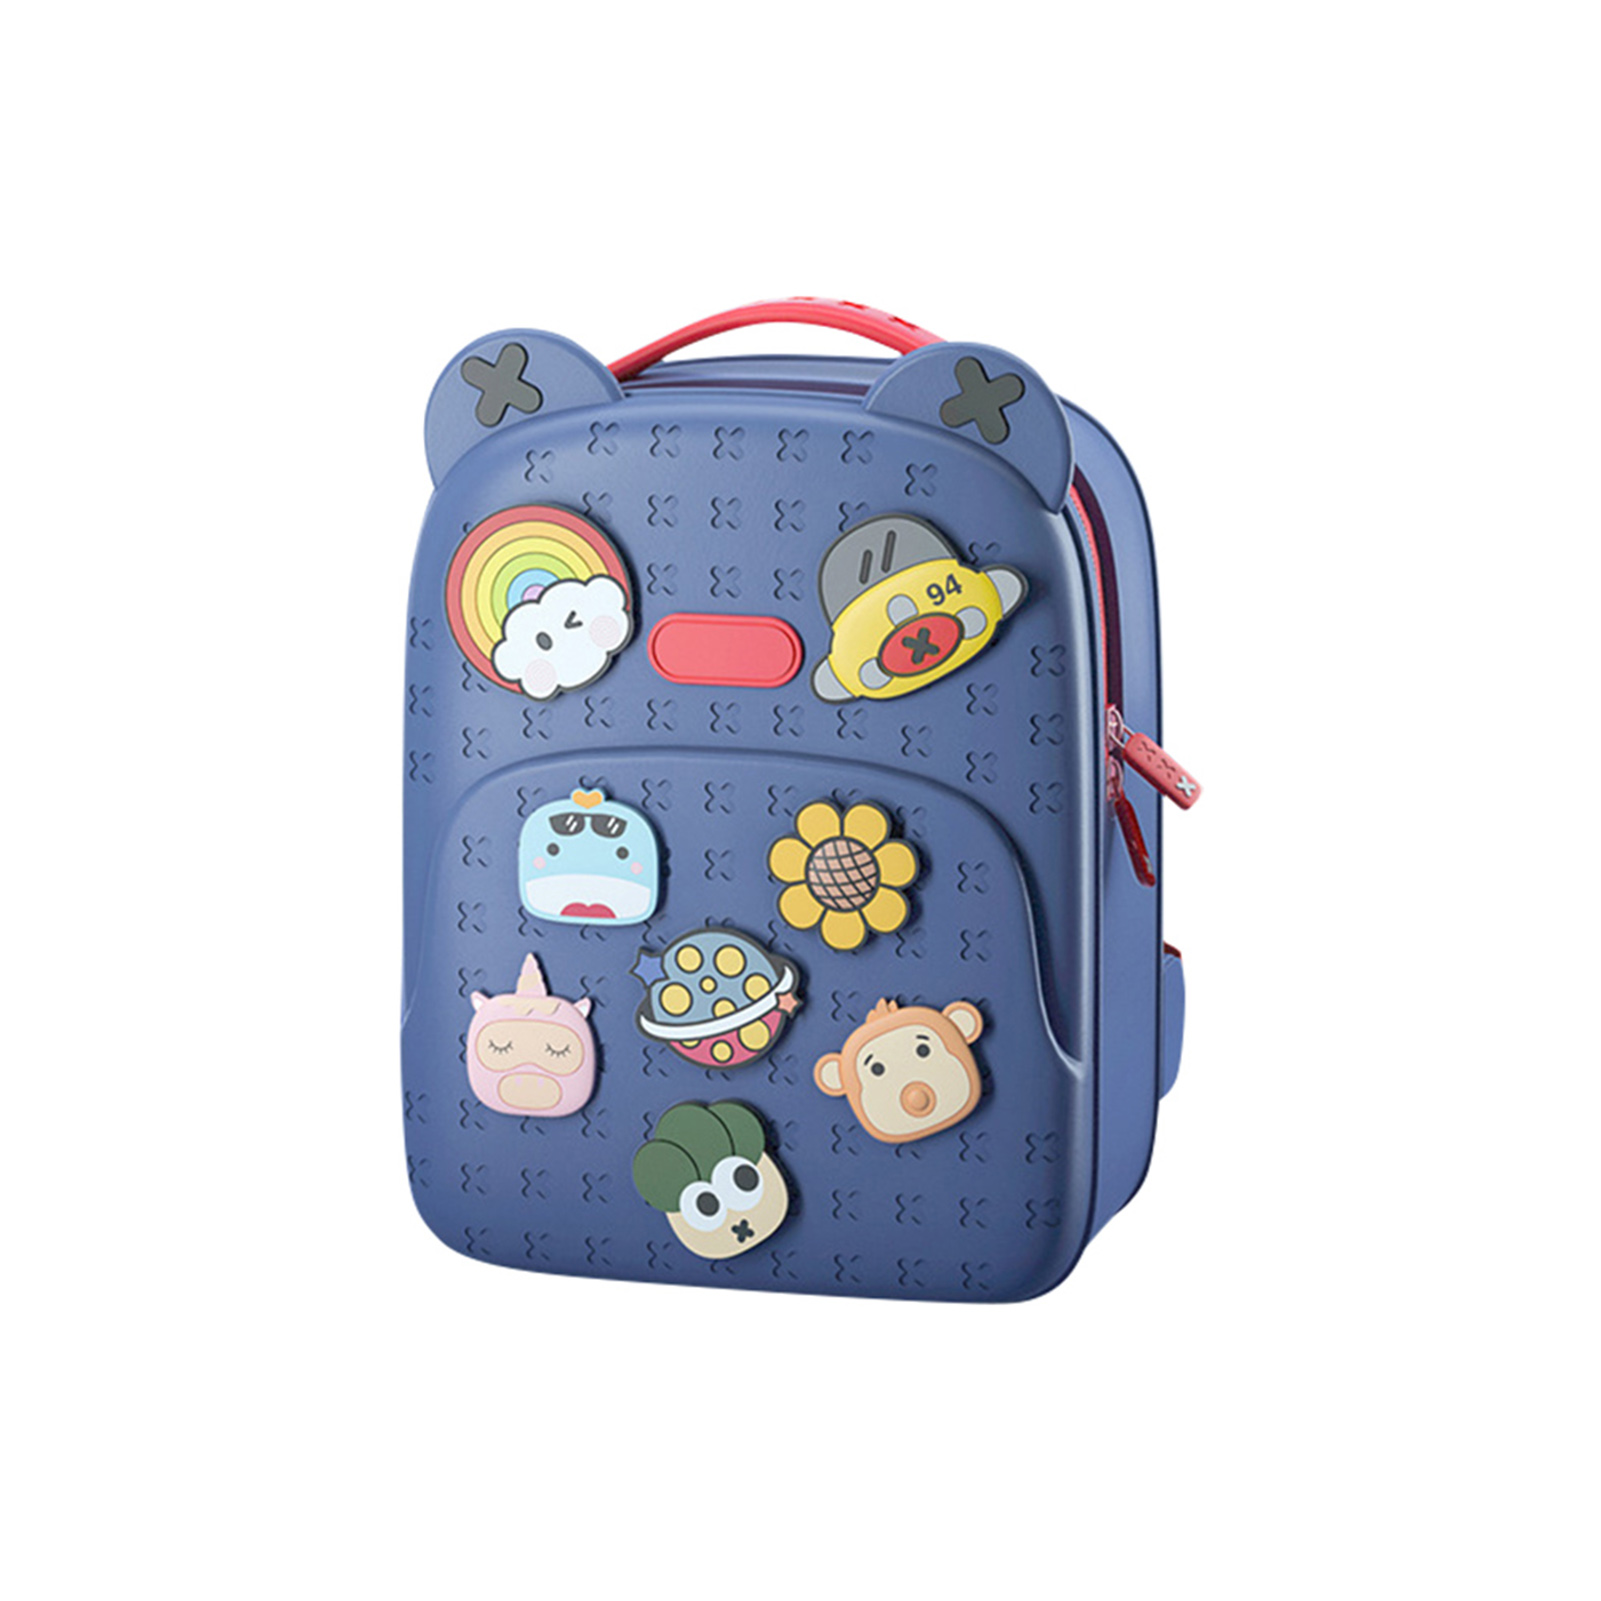 Details about  /3D Animal Backpack Cute Cartoon Backpack Kids School Bag Baby Shoulder Backpack